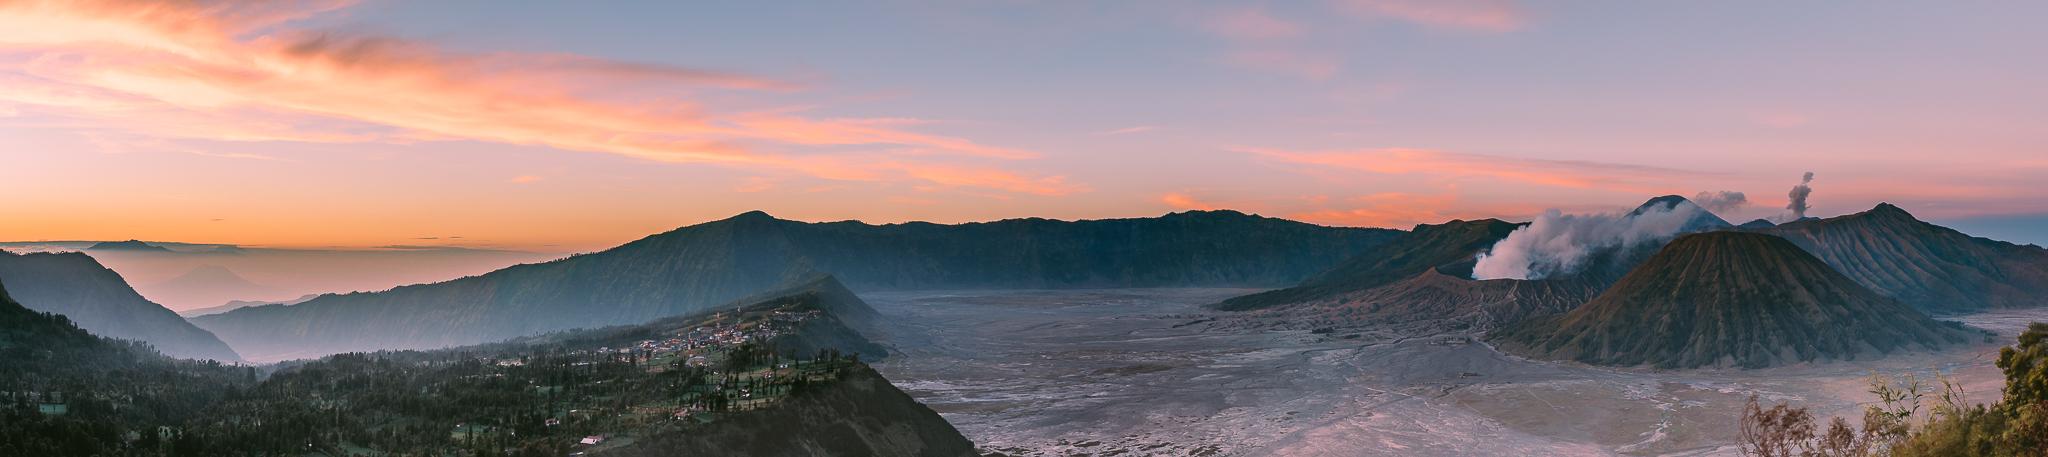 Sunrise panorama from Mt. Penanjakan around 6:30 am.